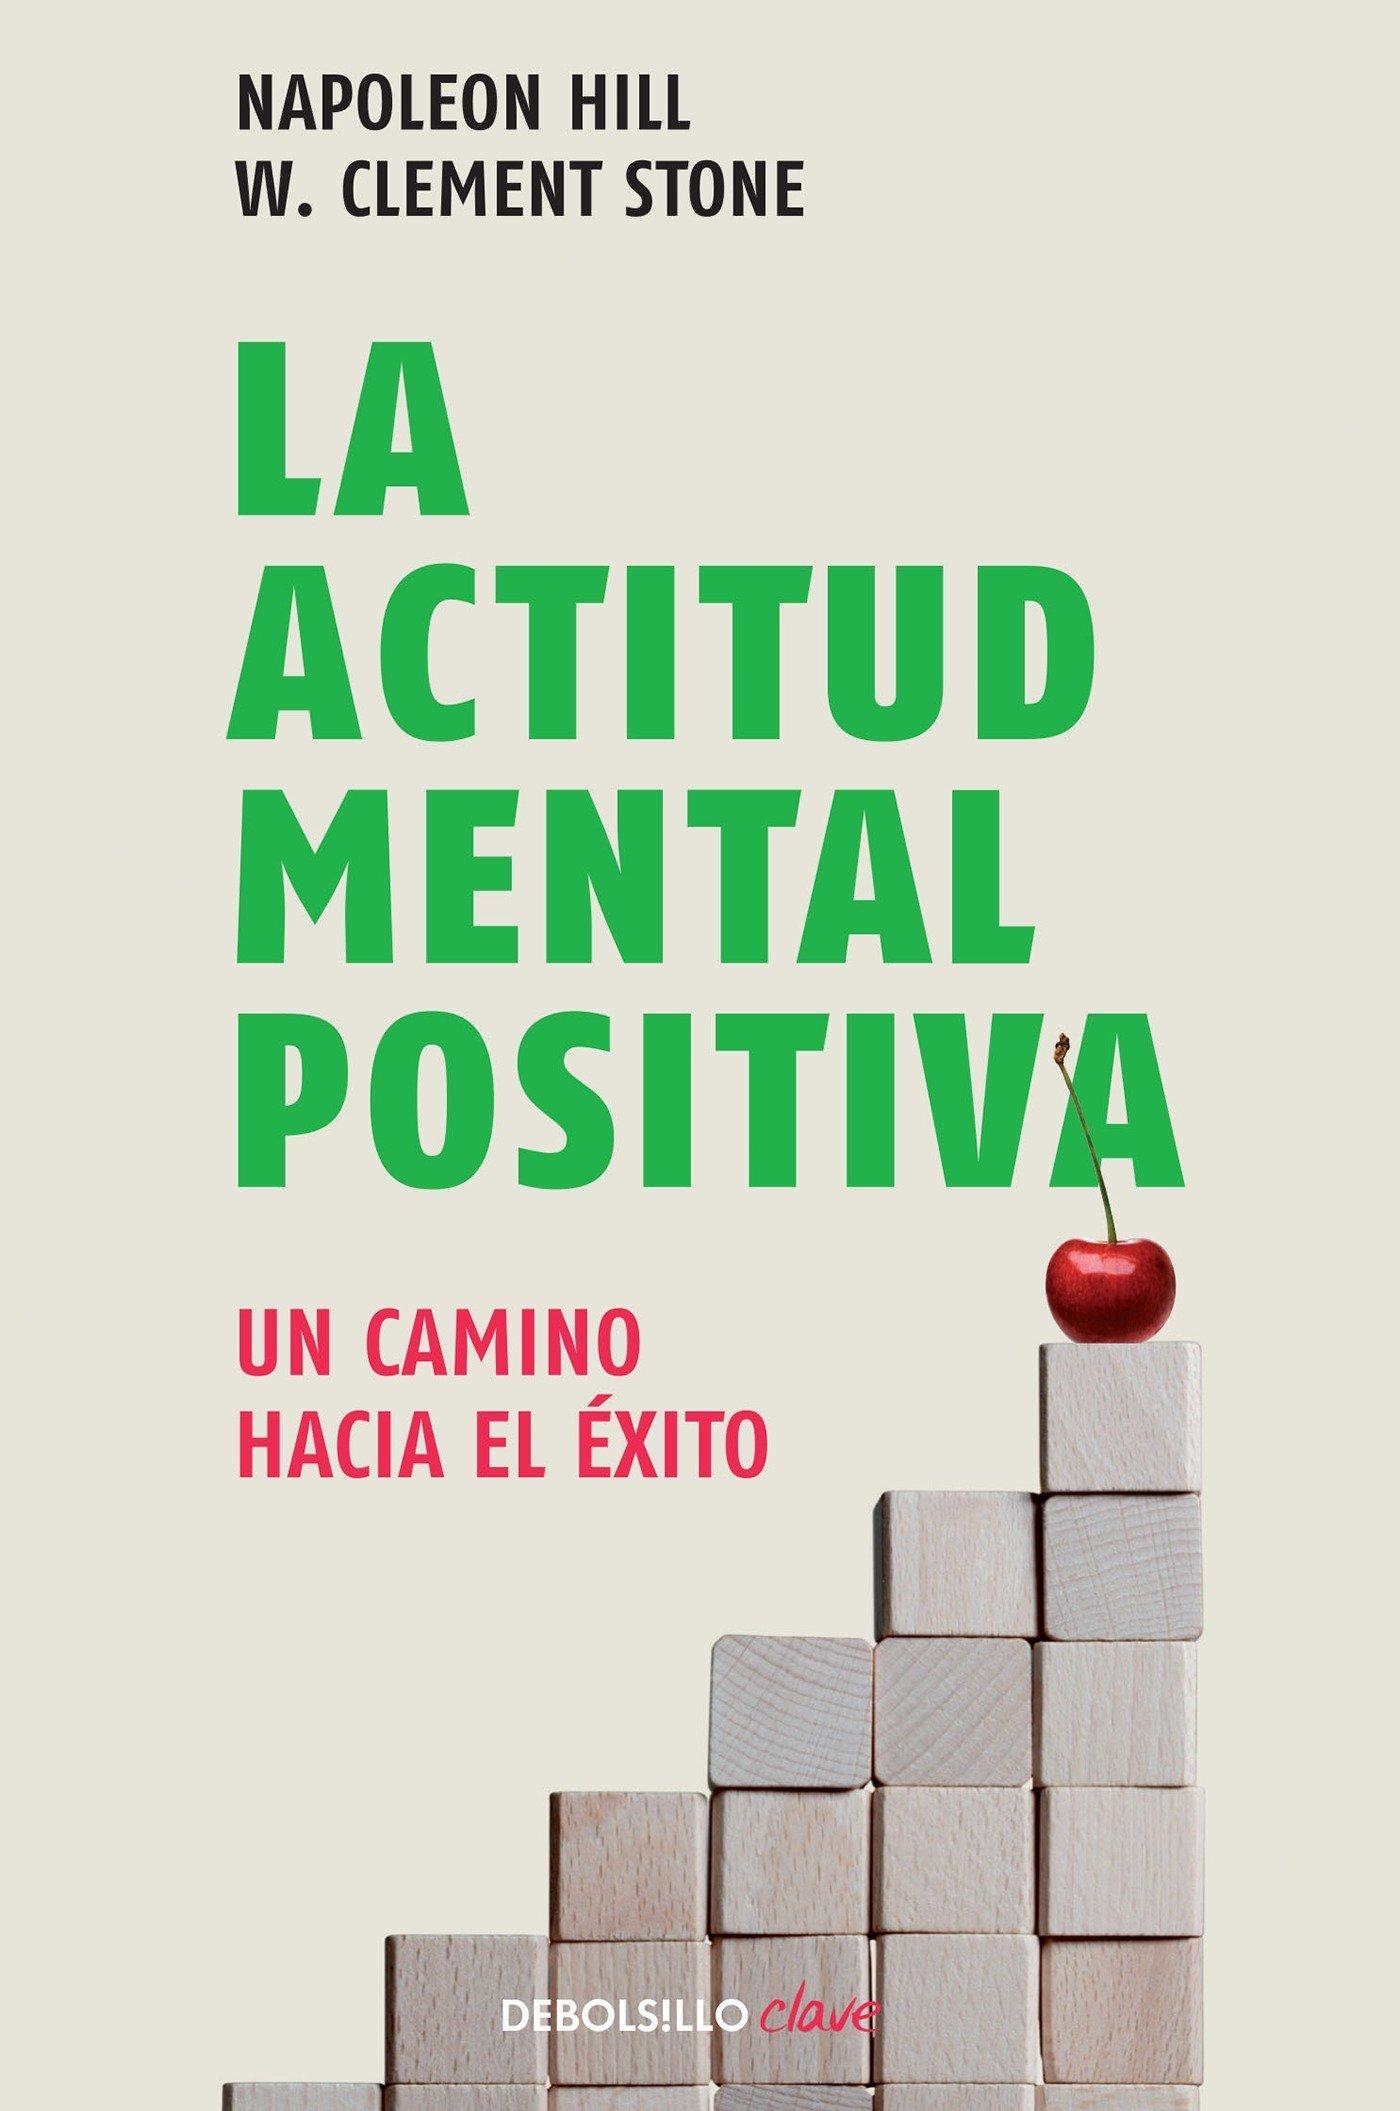 La actitud mental positiva / Success Through A Positive Mental Attitude  (Spanish Edition): Napoleon Hill: 9786073106375: Amazon.com: Books